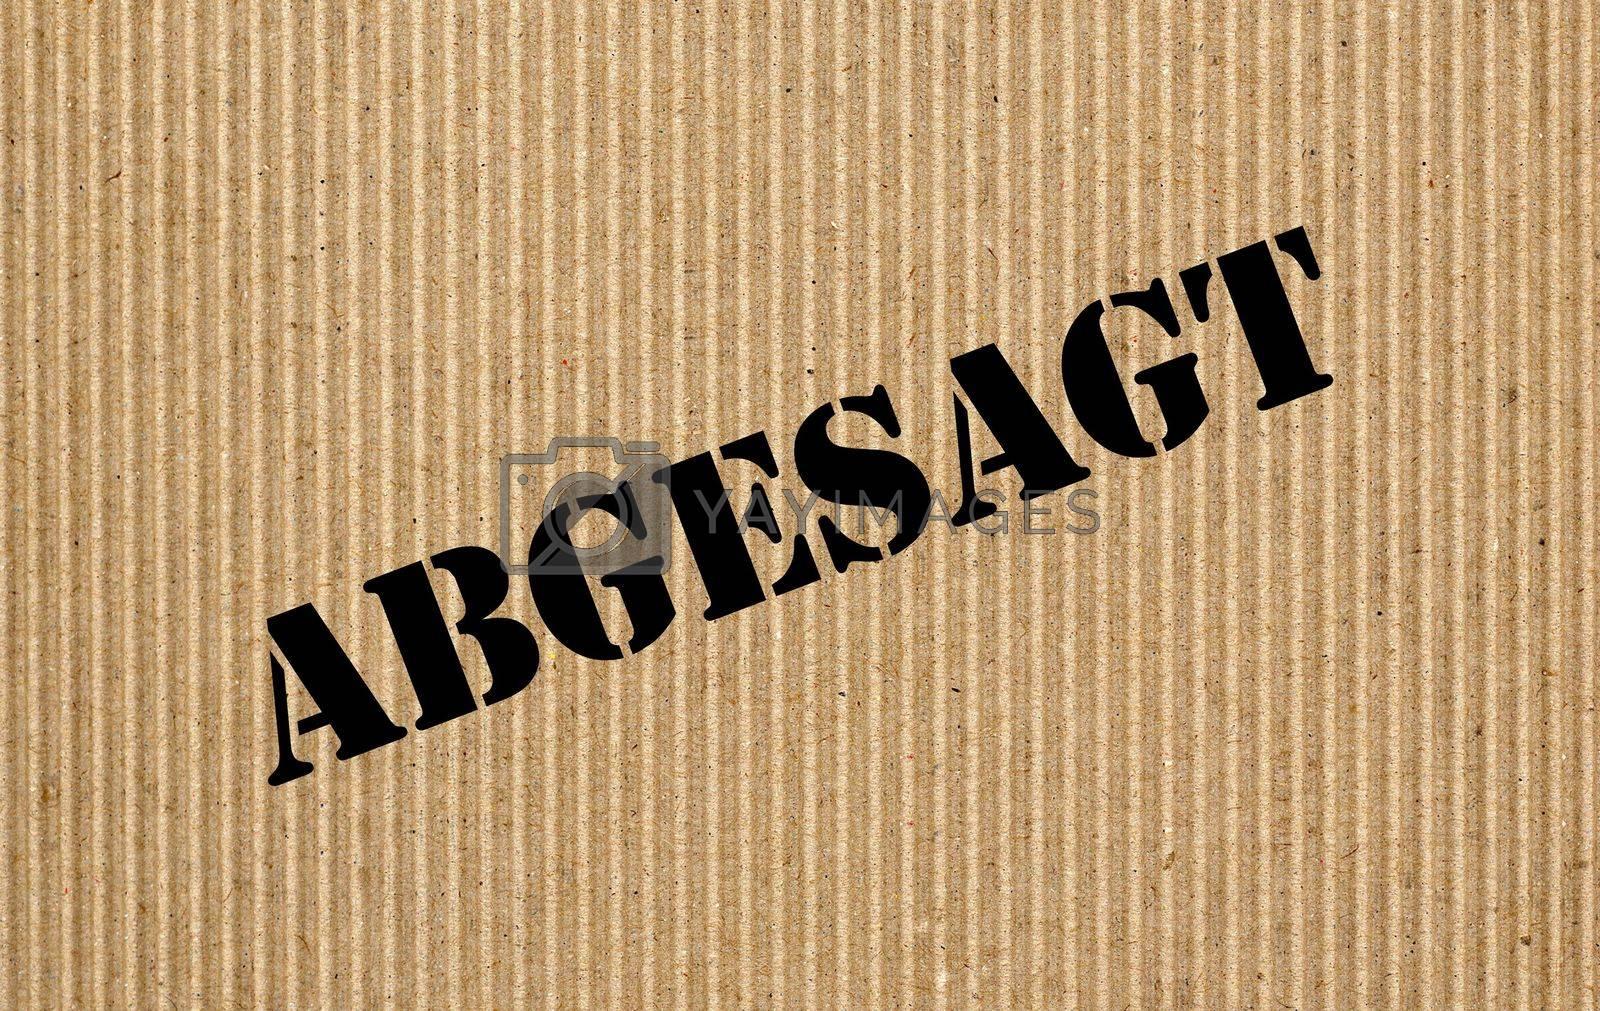 Abgesagt ( translation Cancelled) written on corrugated cardboard